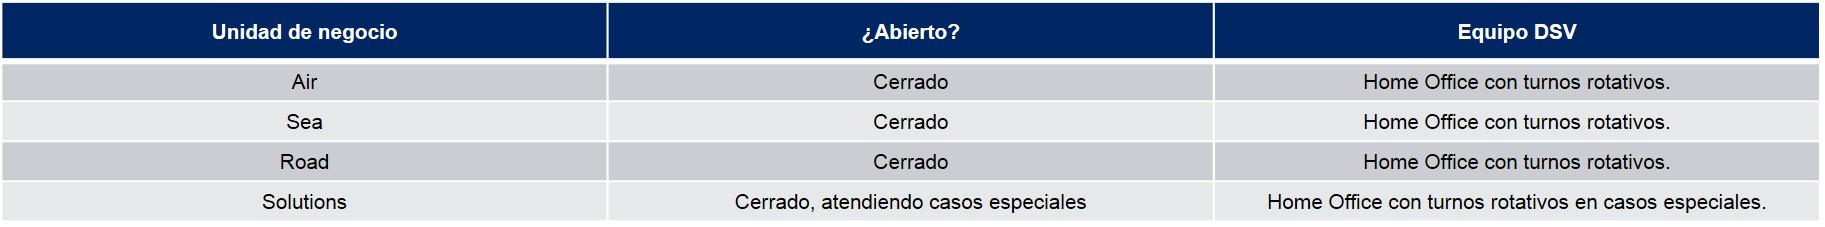 Tabla Operaciones Perú COVID-19 03-04-20